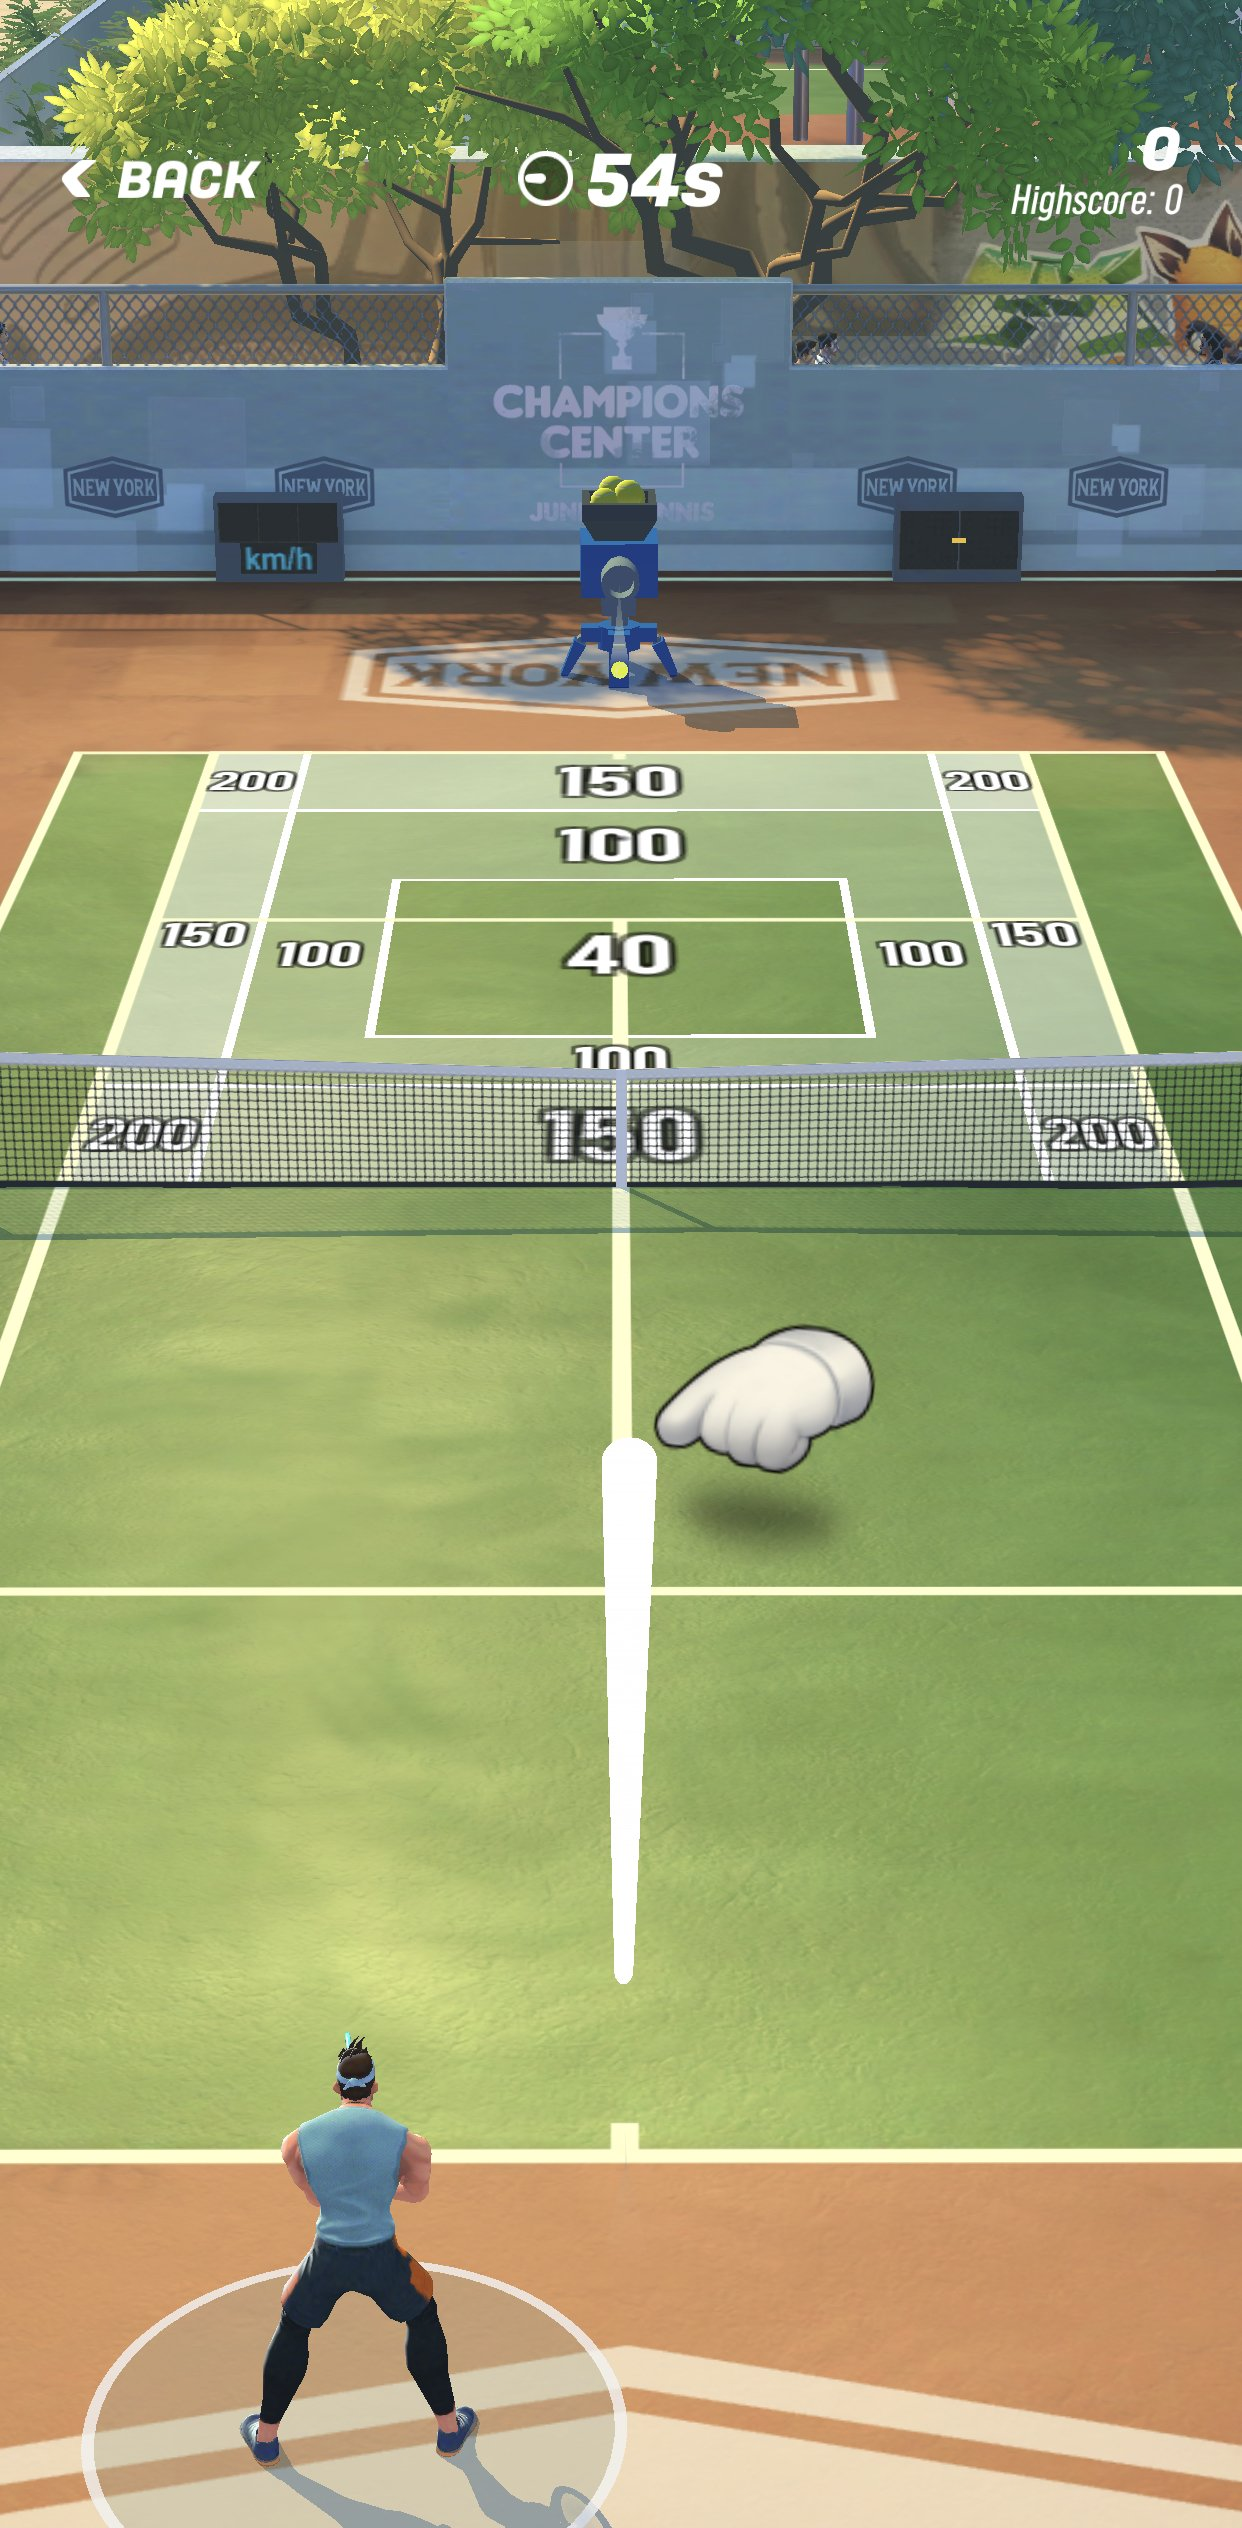 tennis matchmaking Casper dating transgender